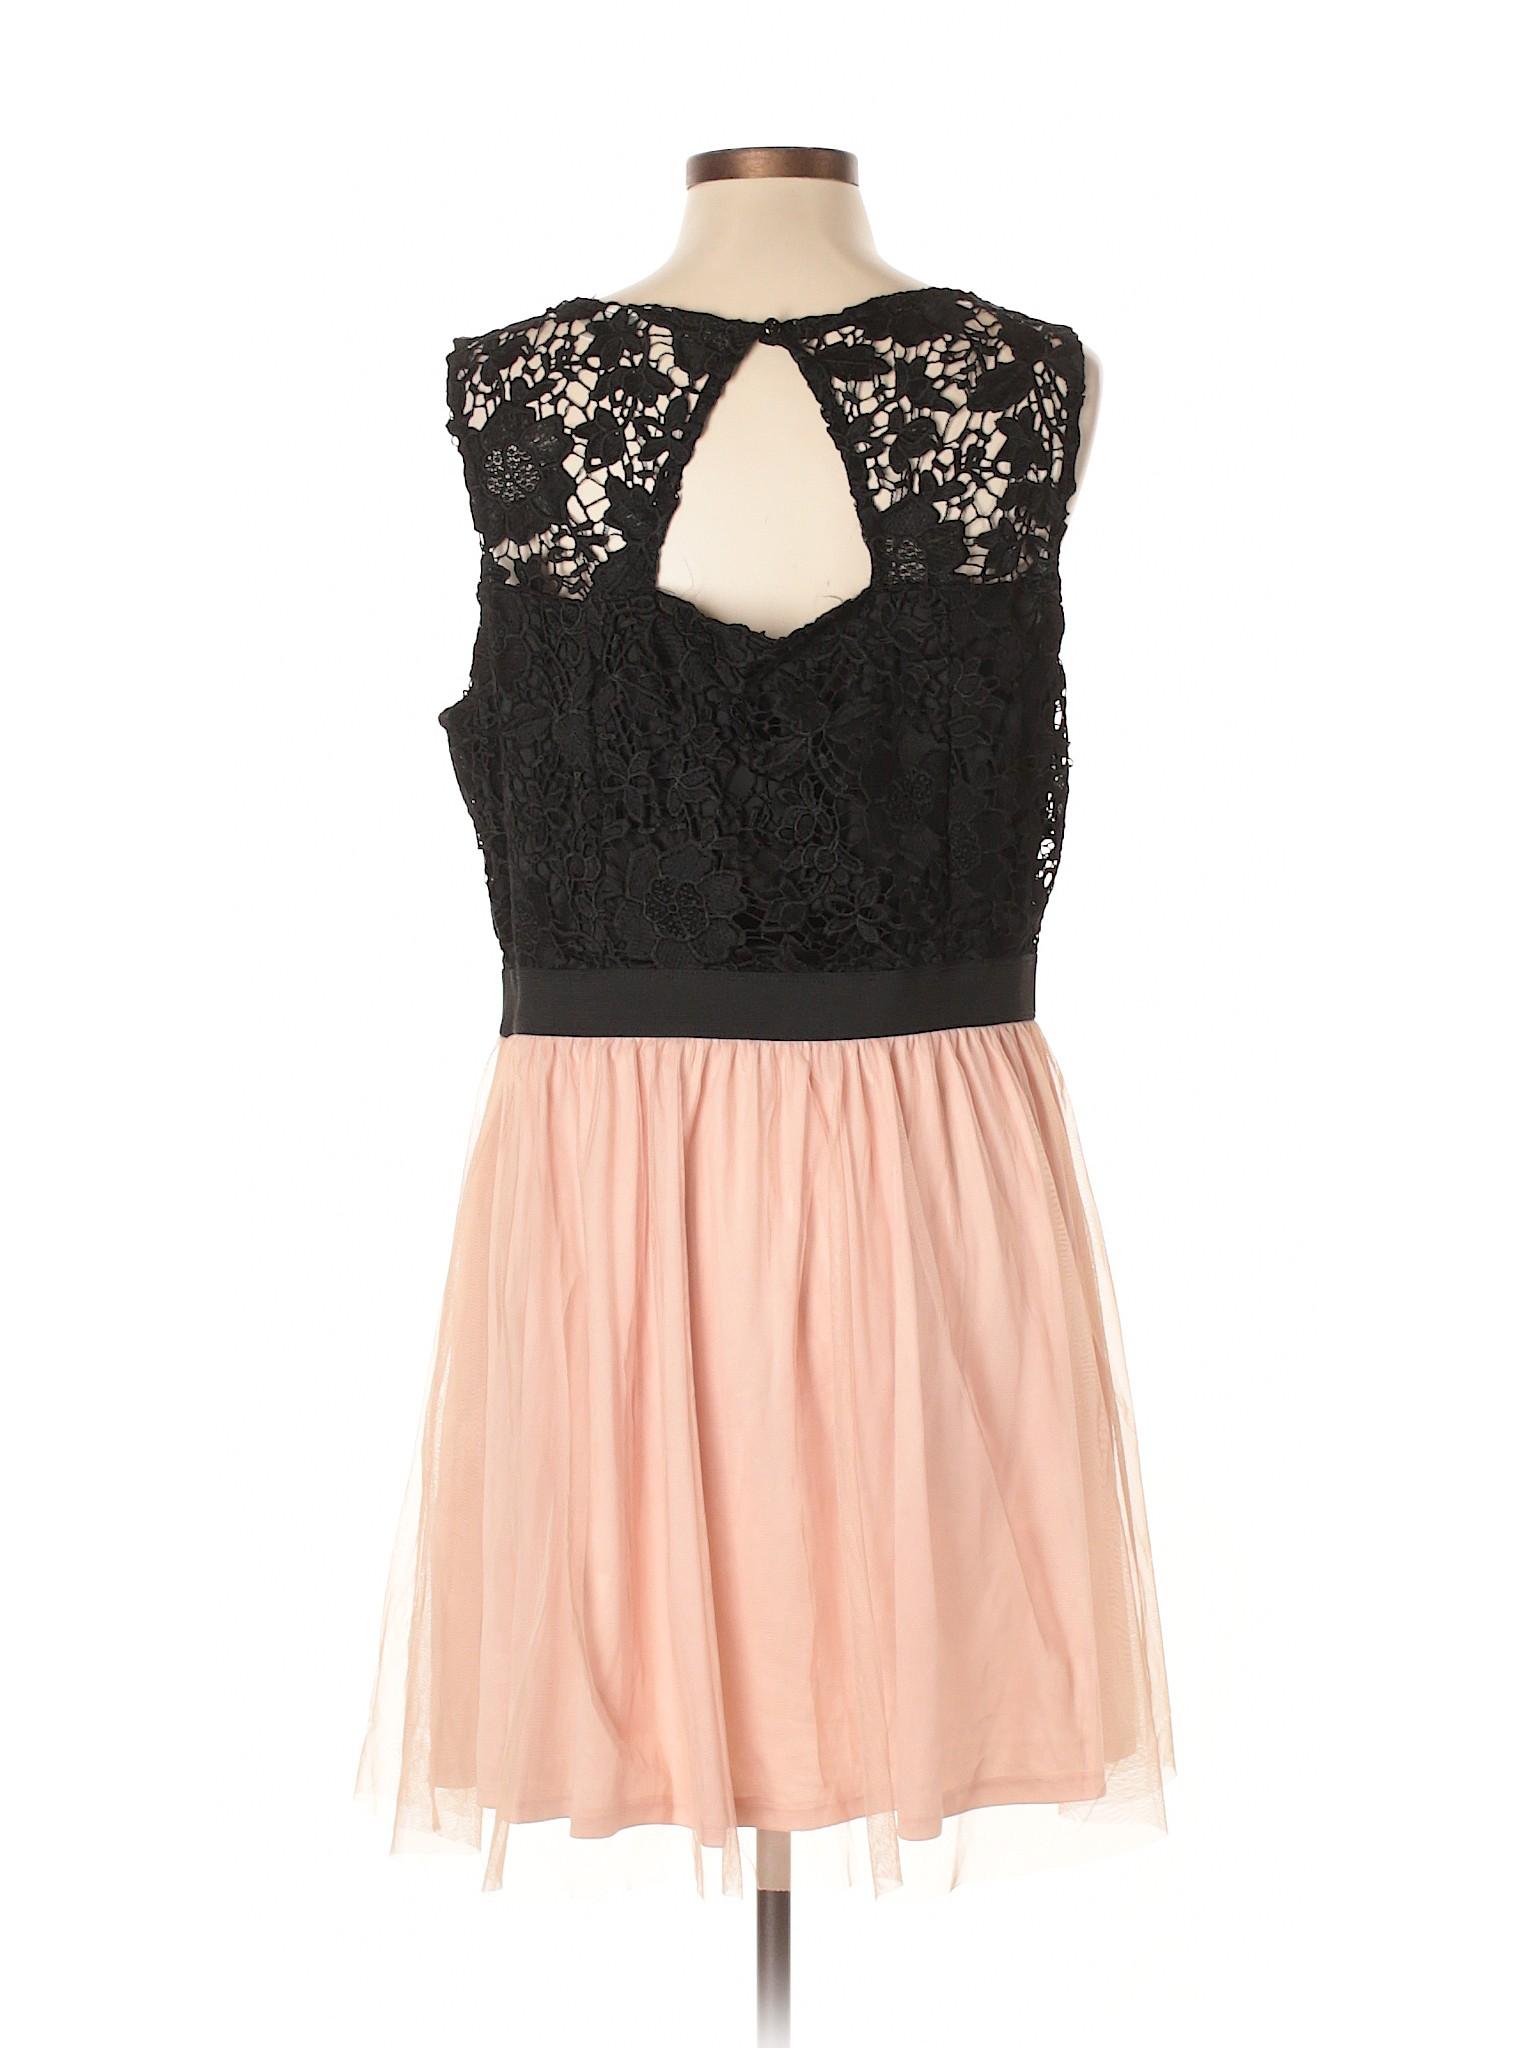 LC Conrad Lauren Dress Selling Casual OzqnWxZx7